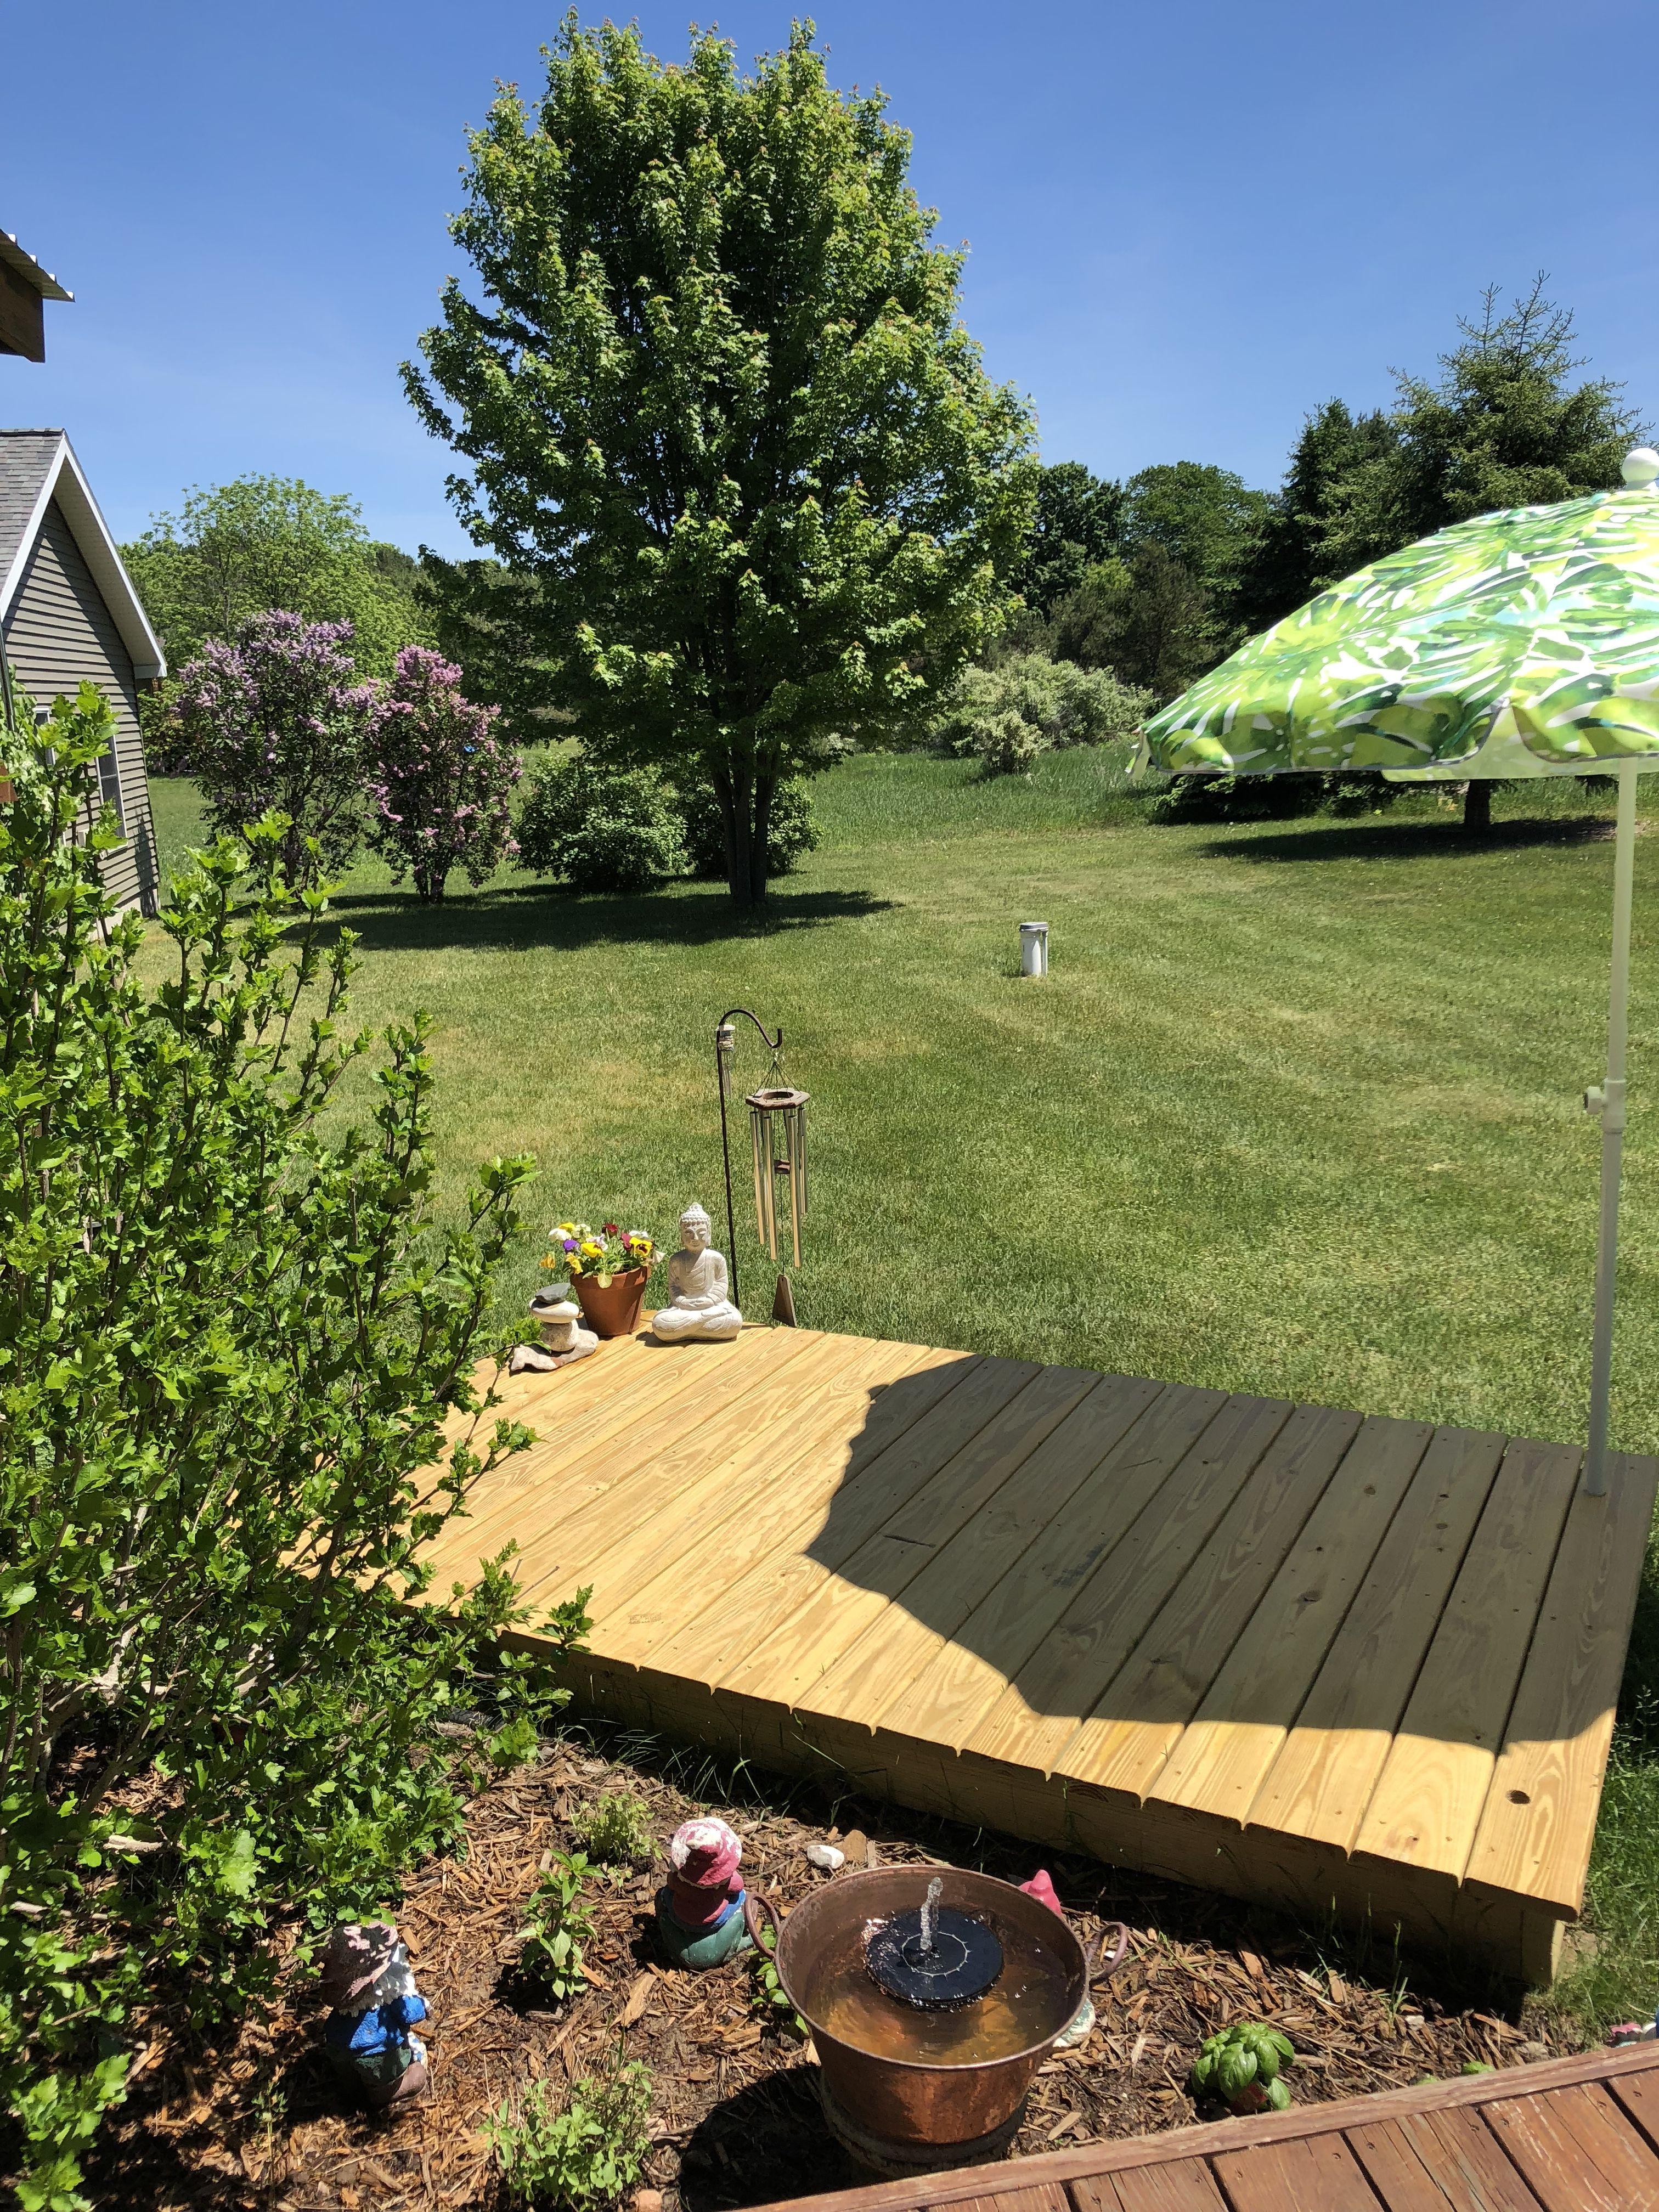 Outdoor Yoga Platform Easy To Make Next To My Herb Garden Outdoor Meditation Meditation Space Outdoor Outdoor Yoga Space Diy backyard yoga studio